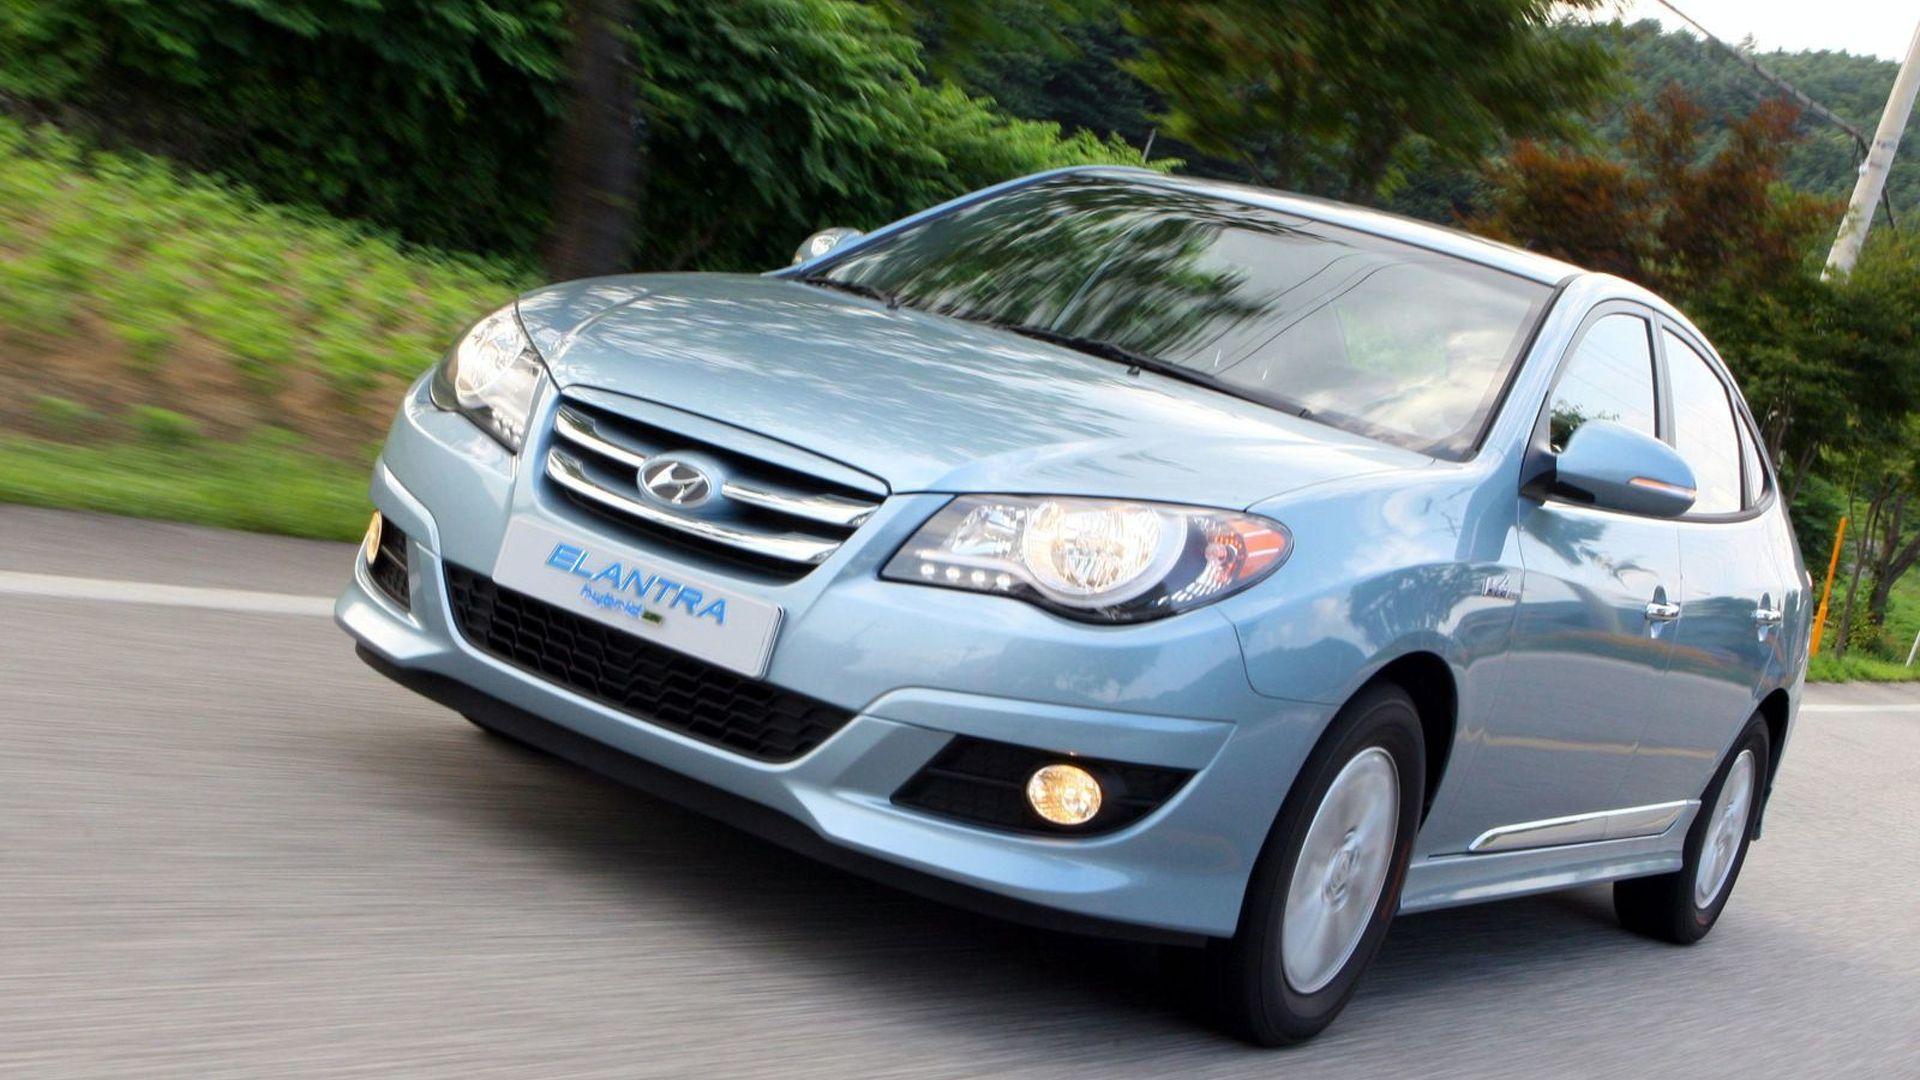 Hyundai launches world's first LPG powered hybrid - Elantra LPI HEV